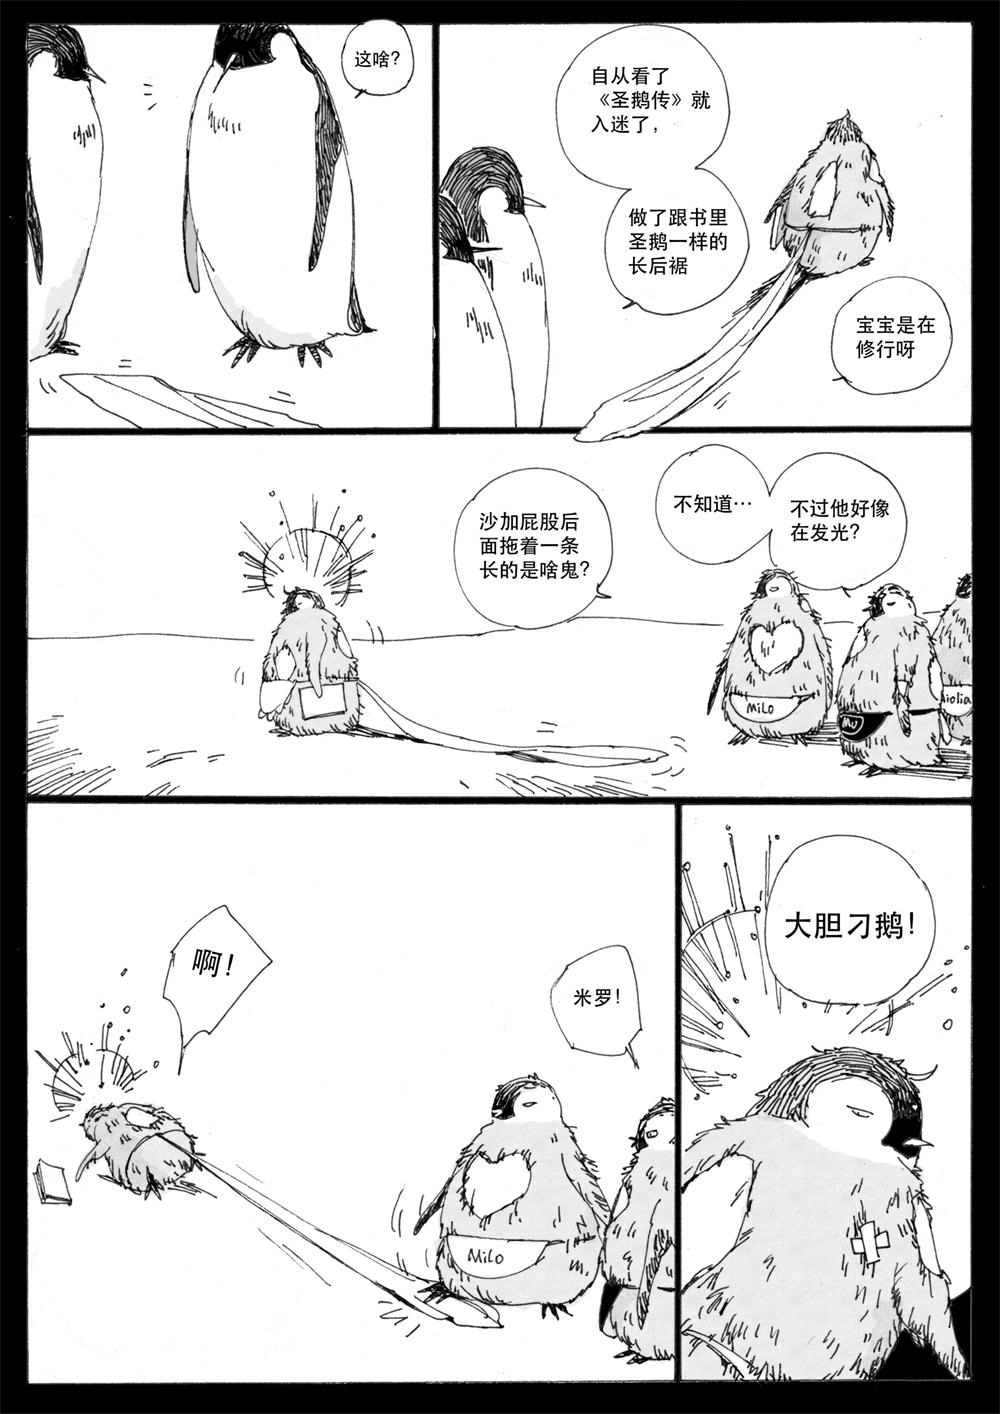 penguin36_1000